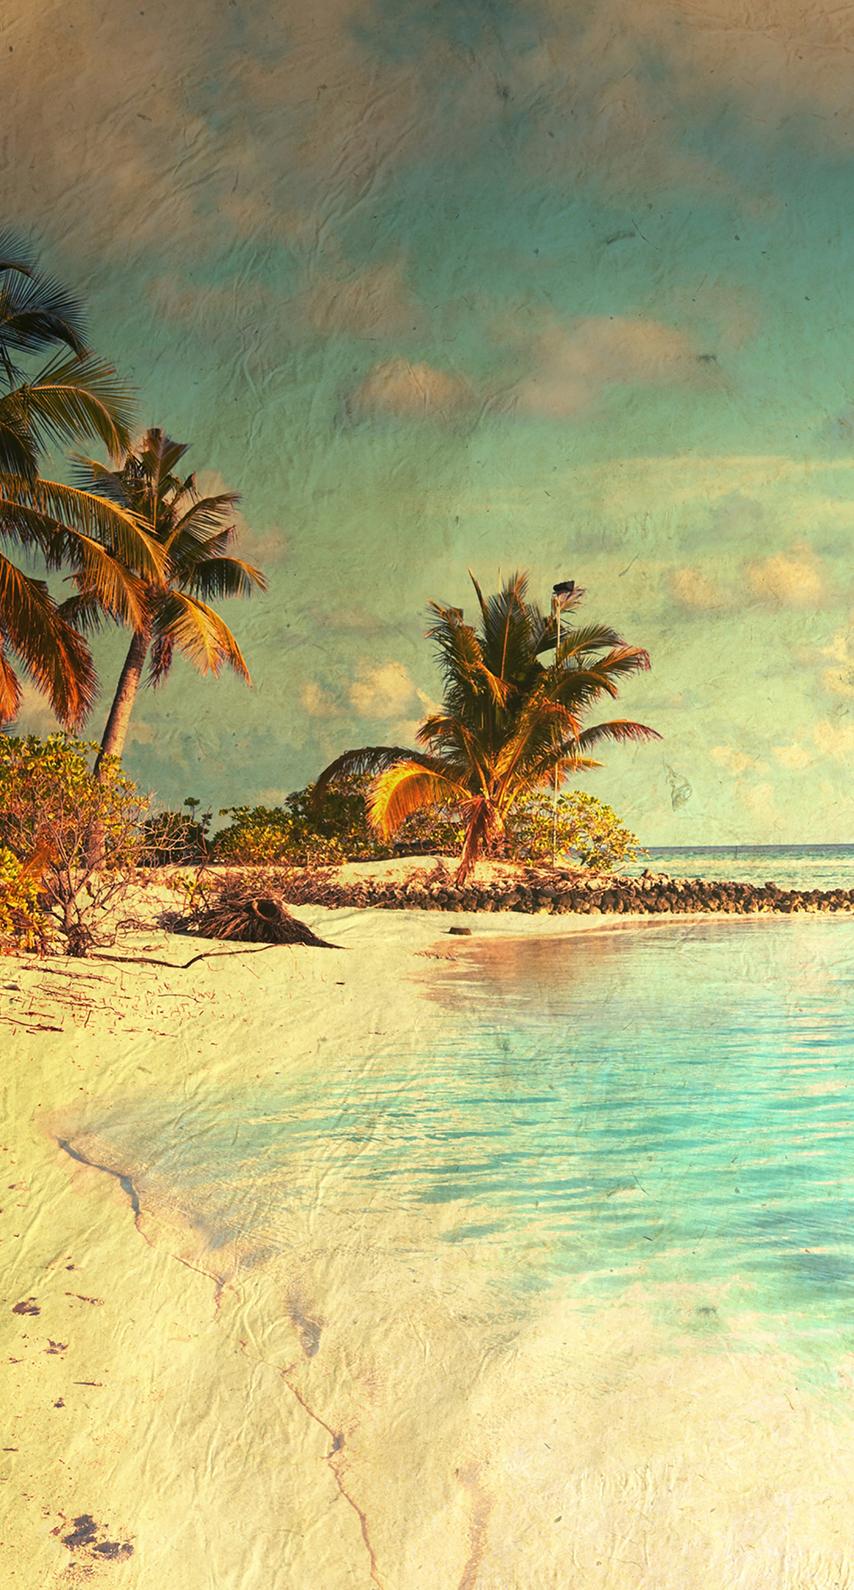 water, ocean